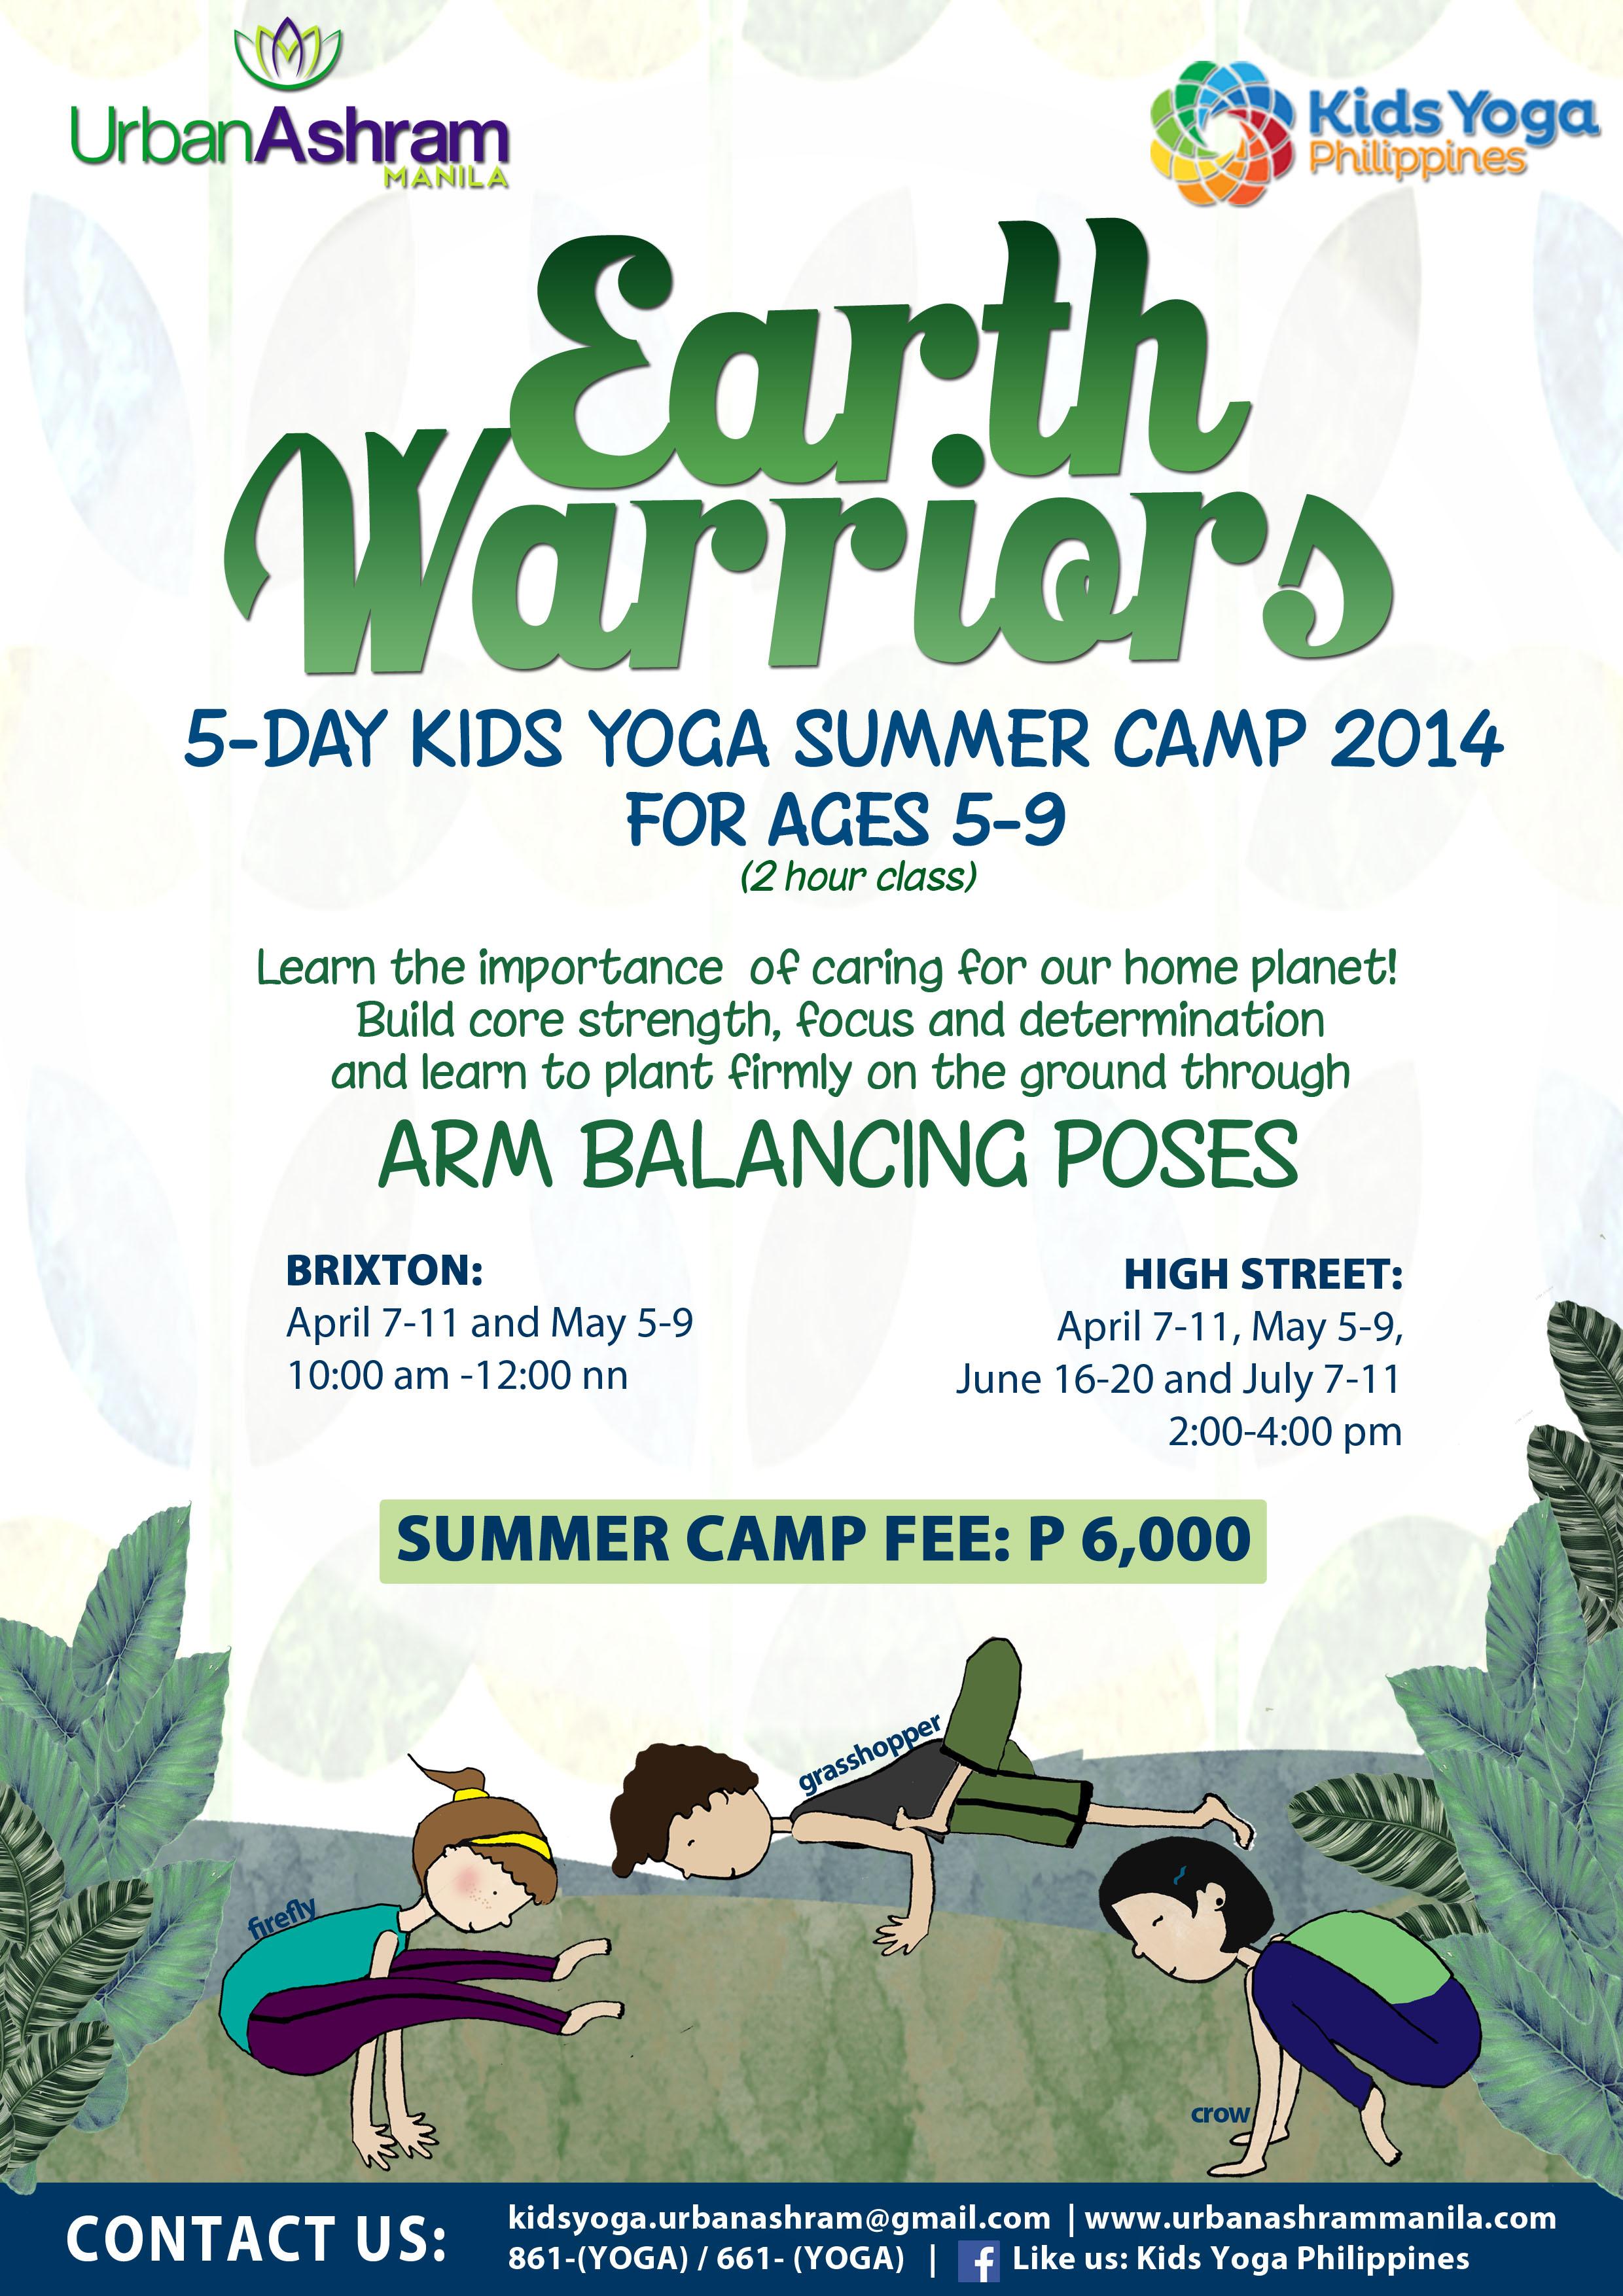 KIDS YOGA SUMMER CAMP 2014